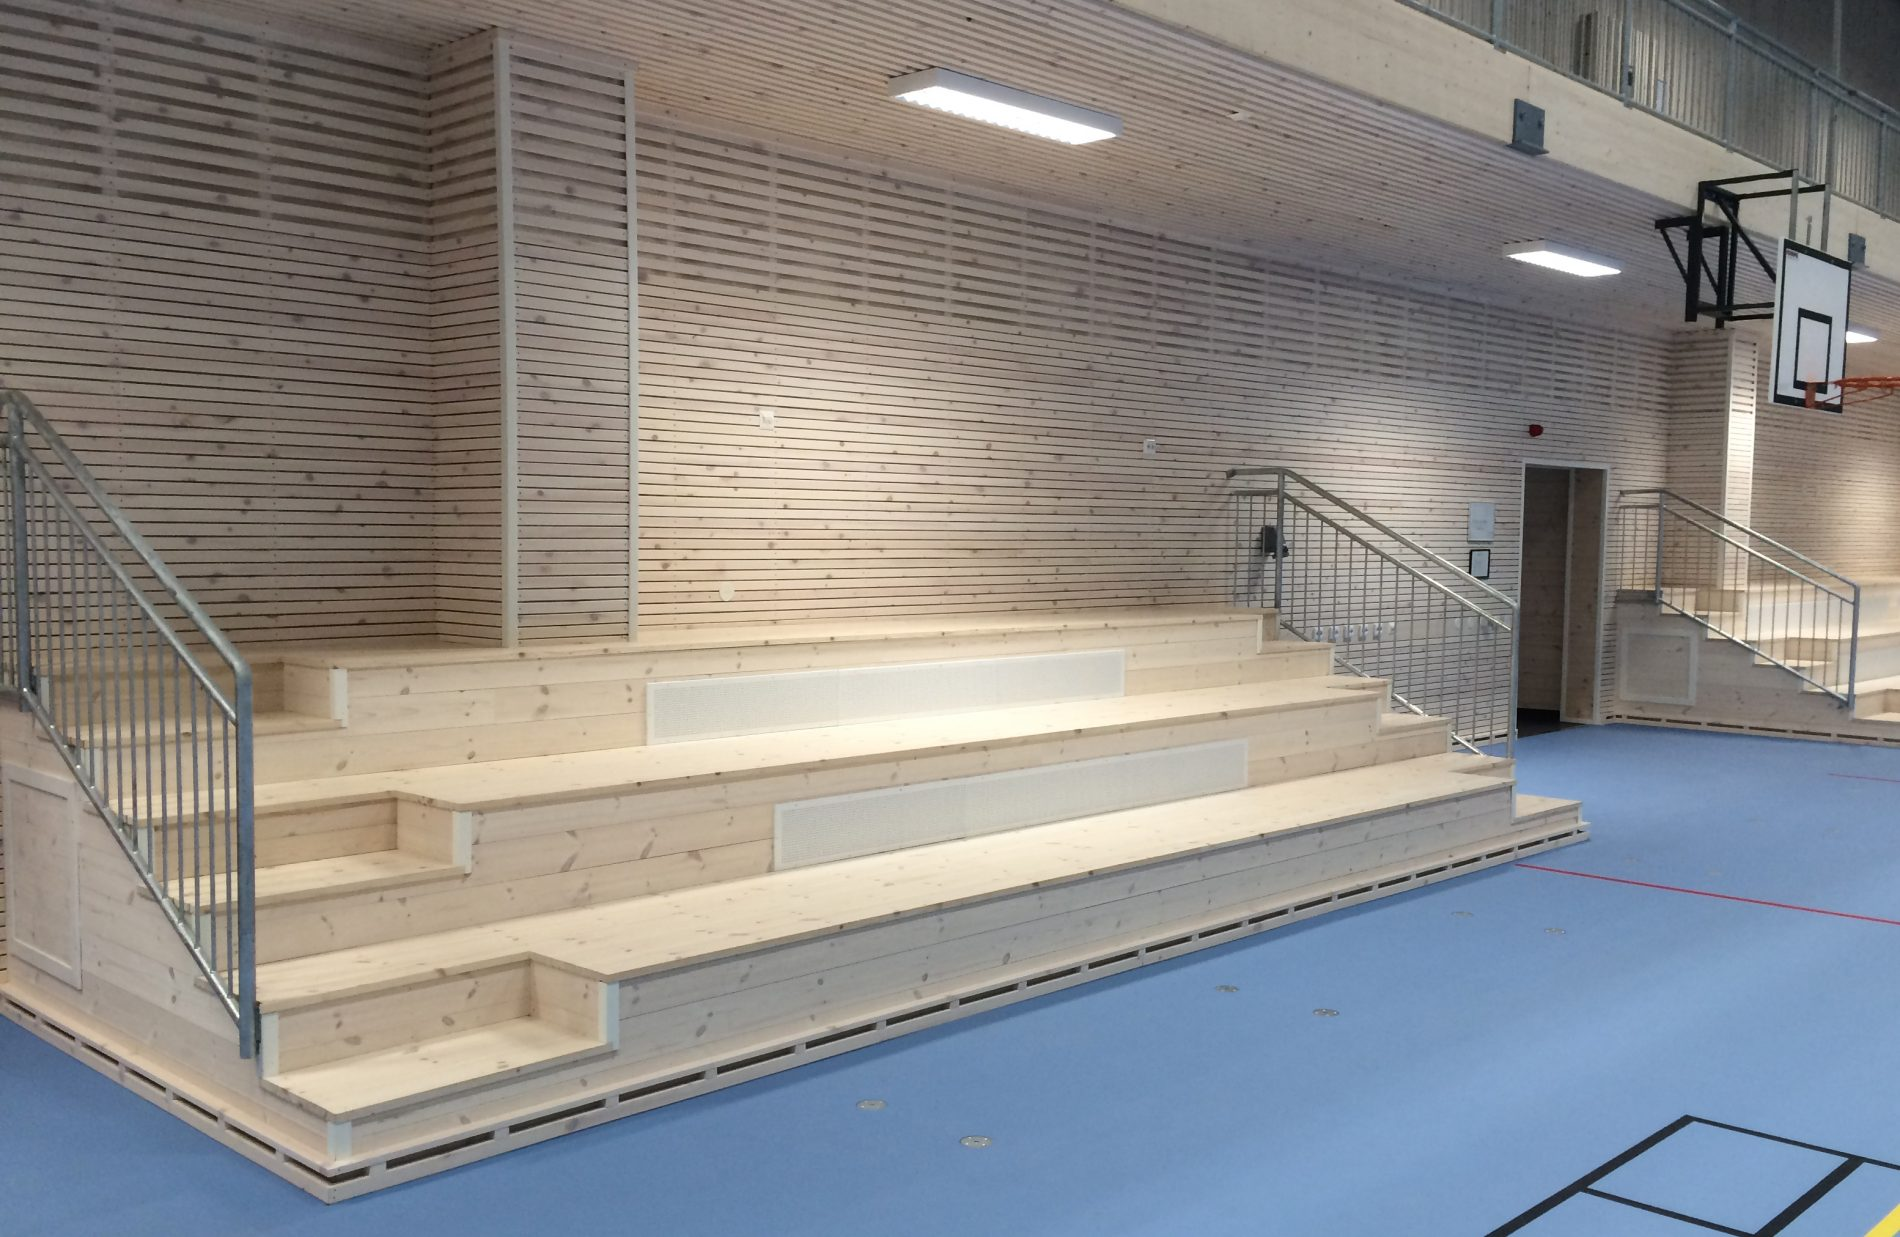 Bygland Idrettshall